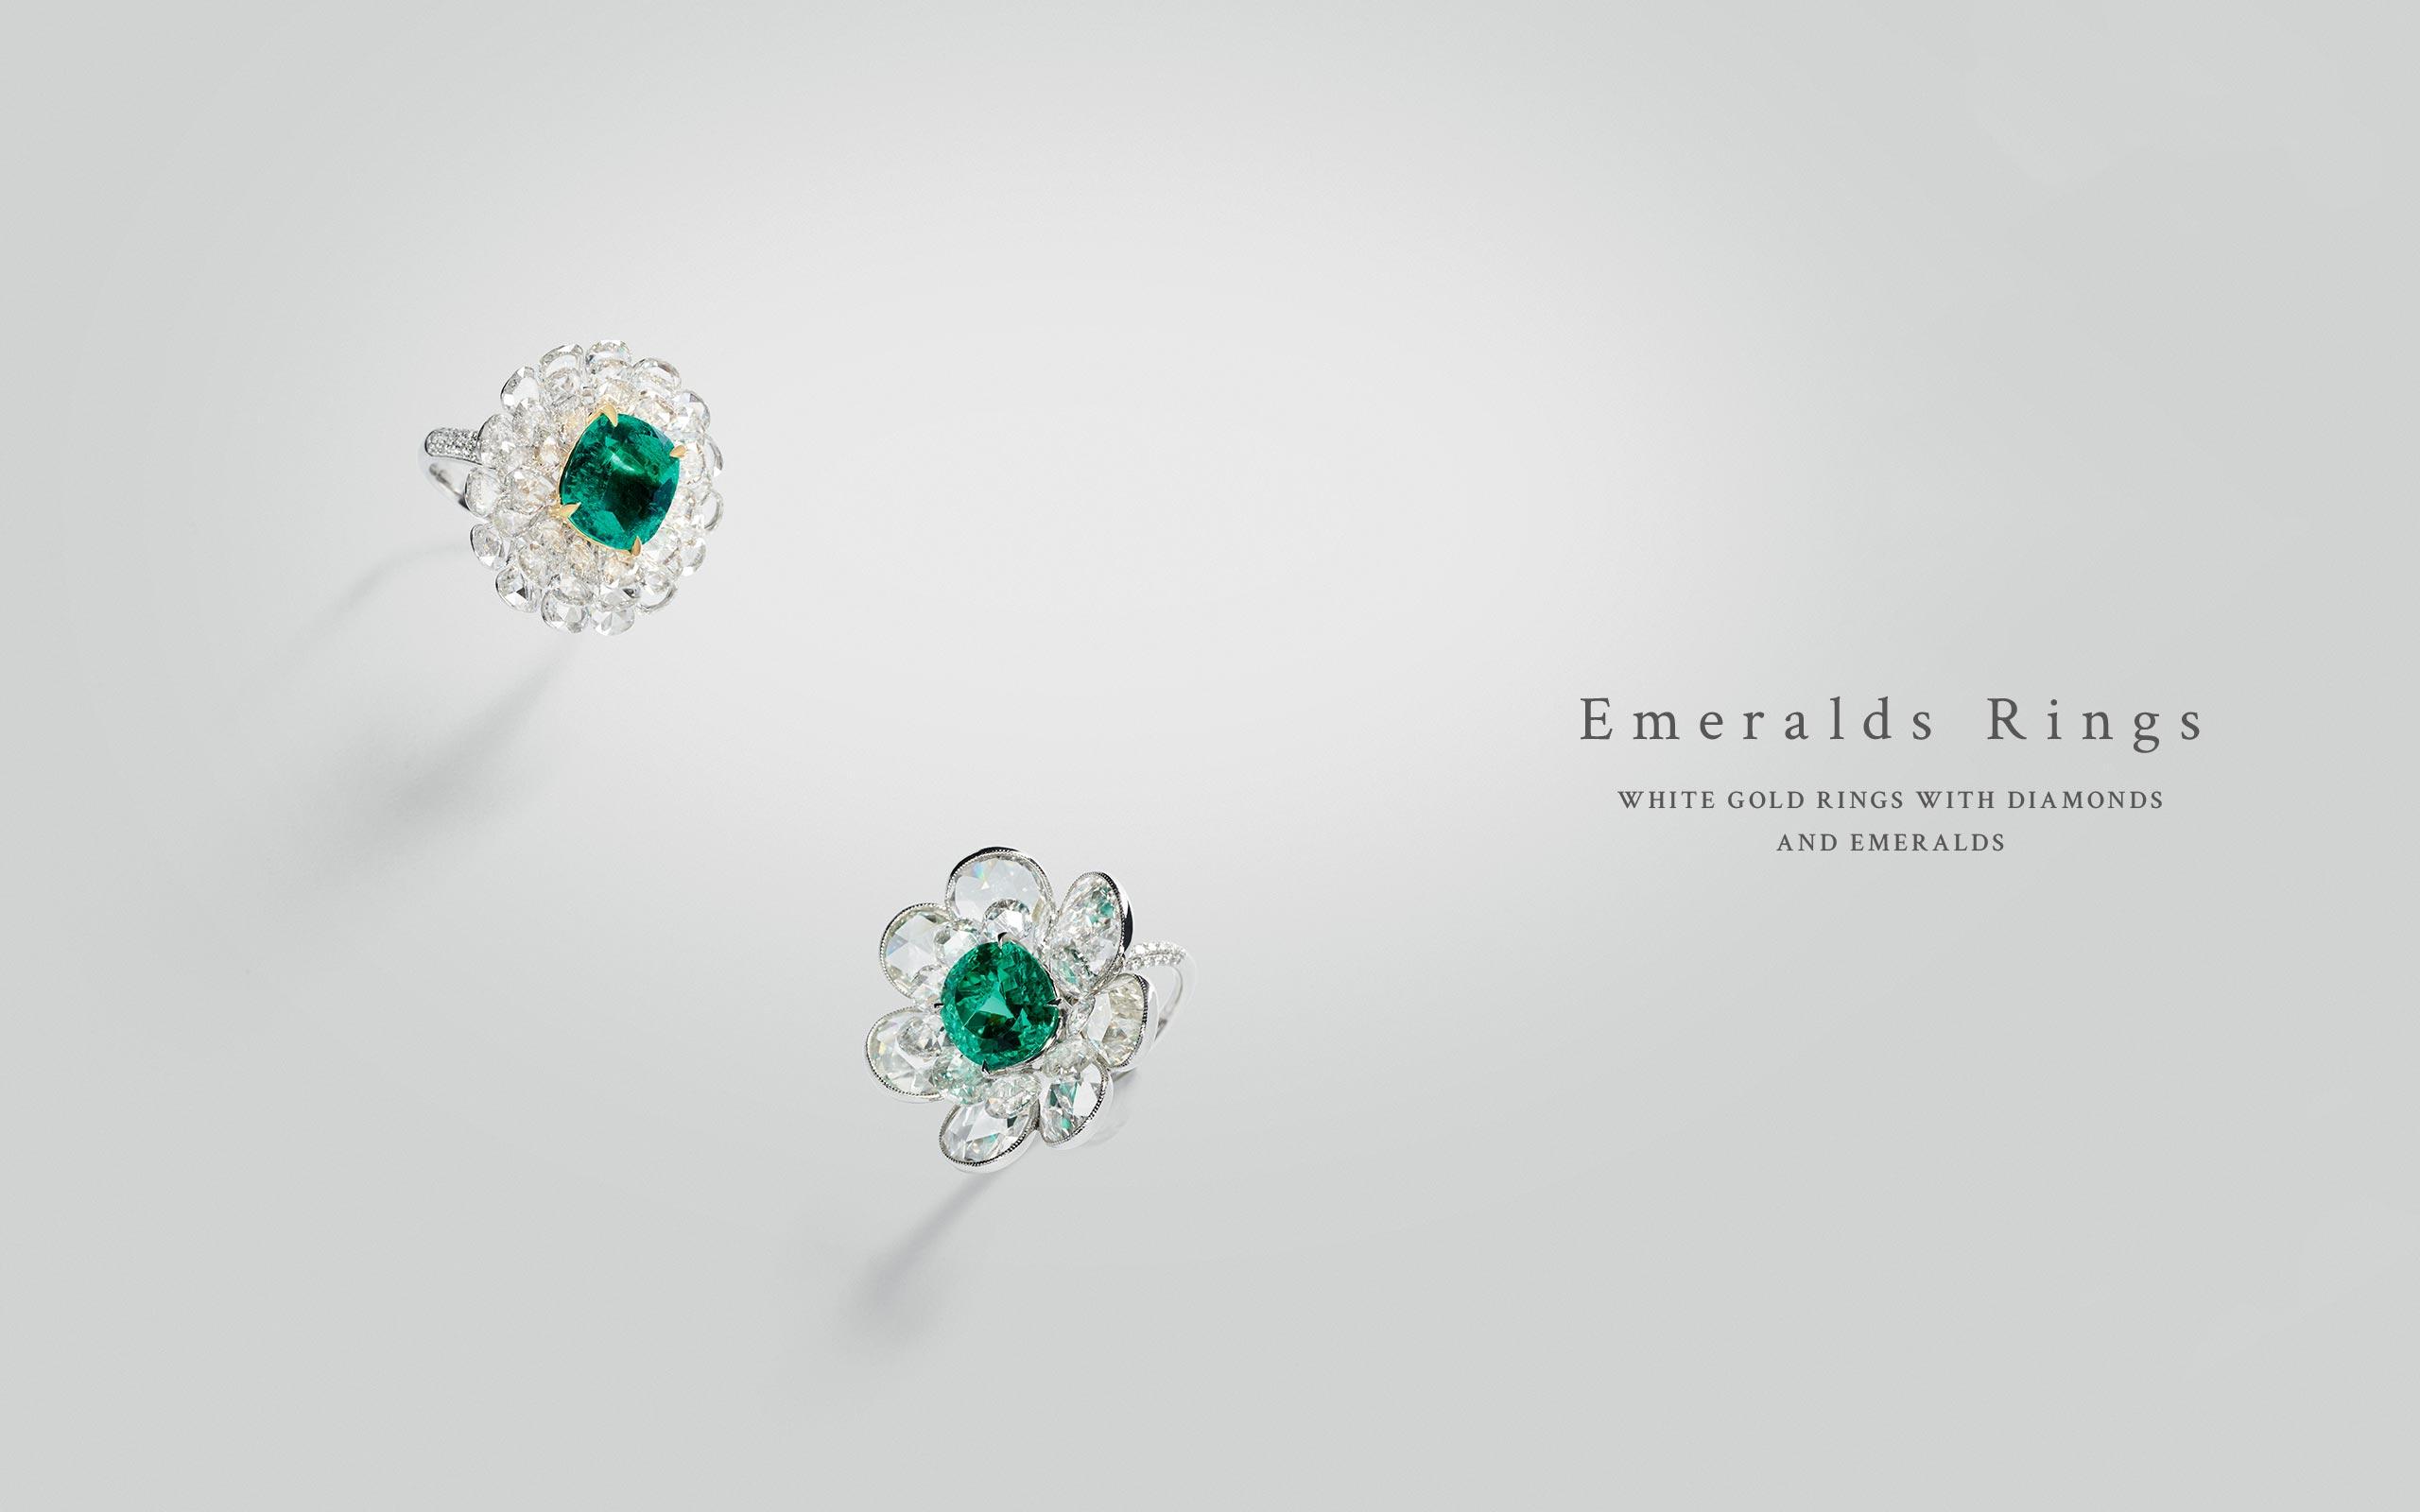 Emerald Rings 02 | Maria Gaspari